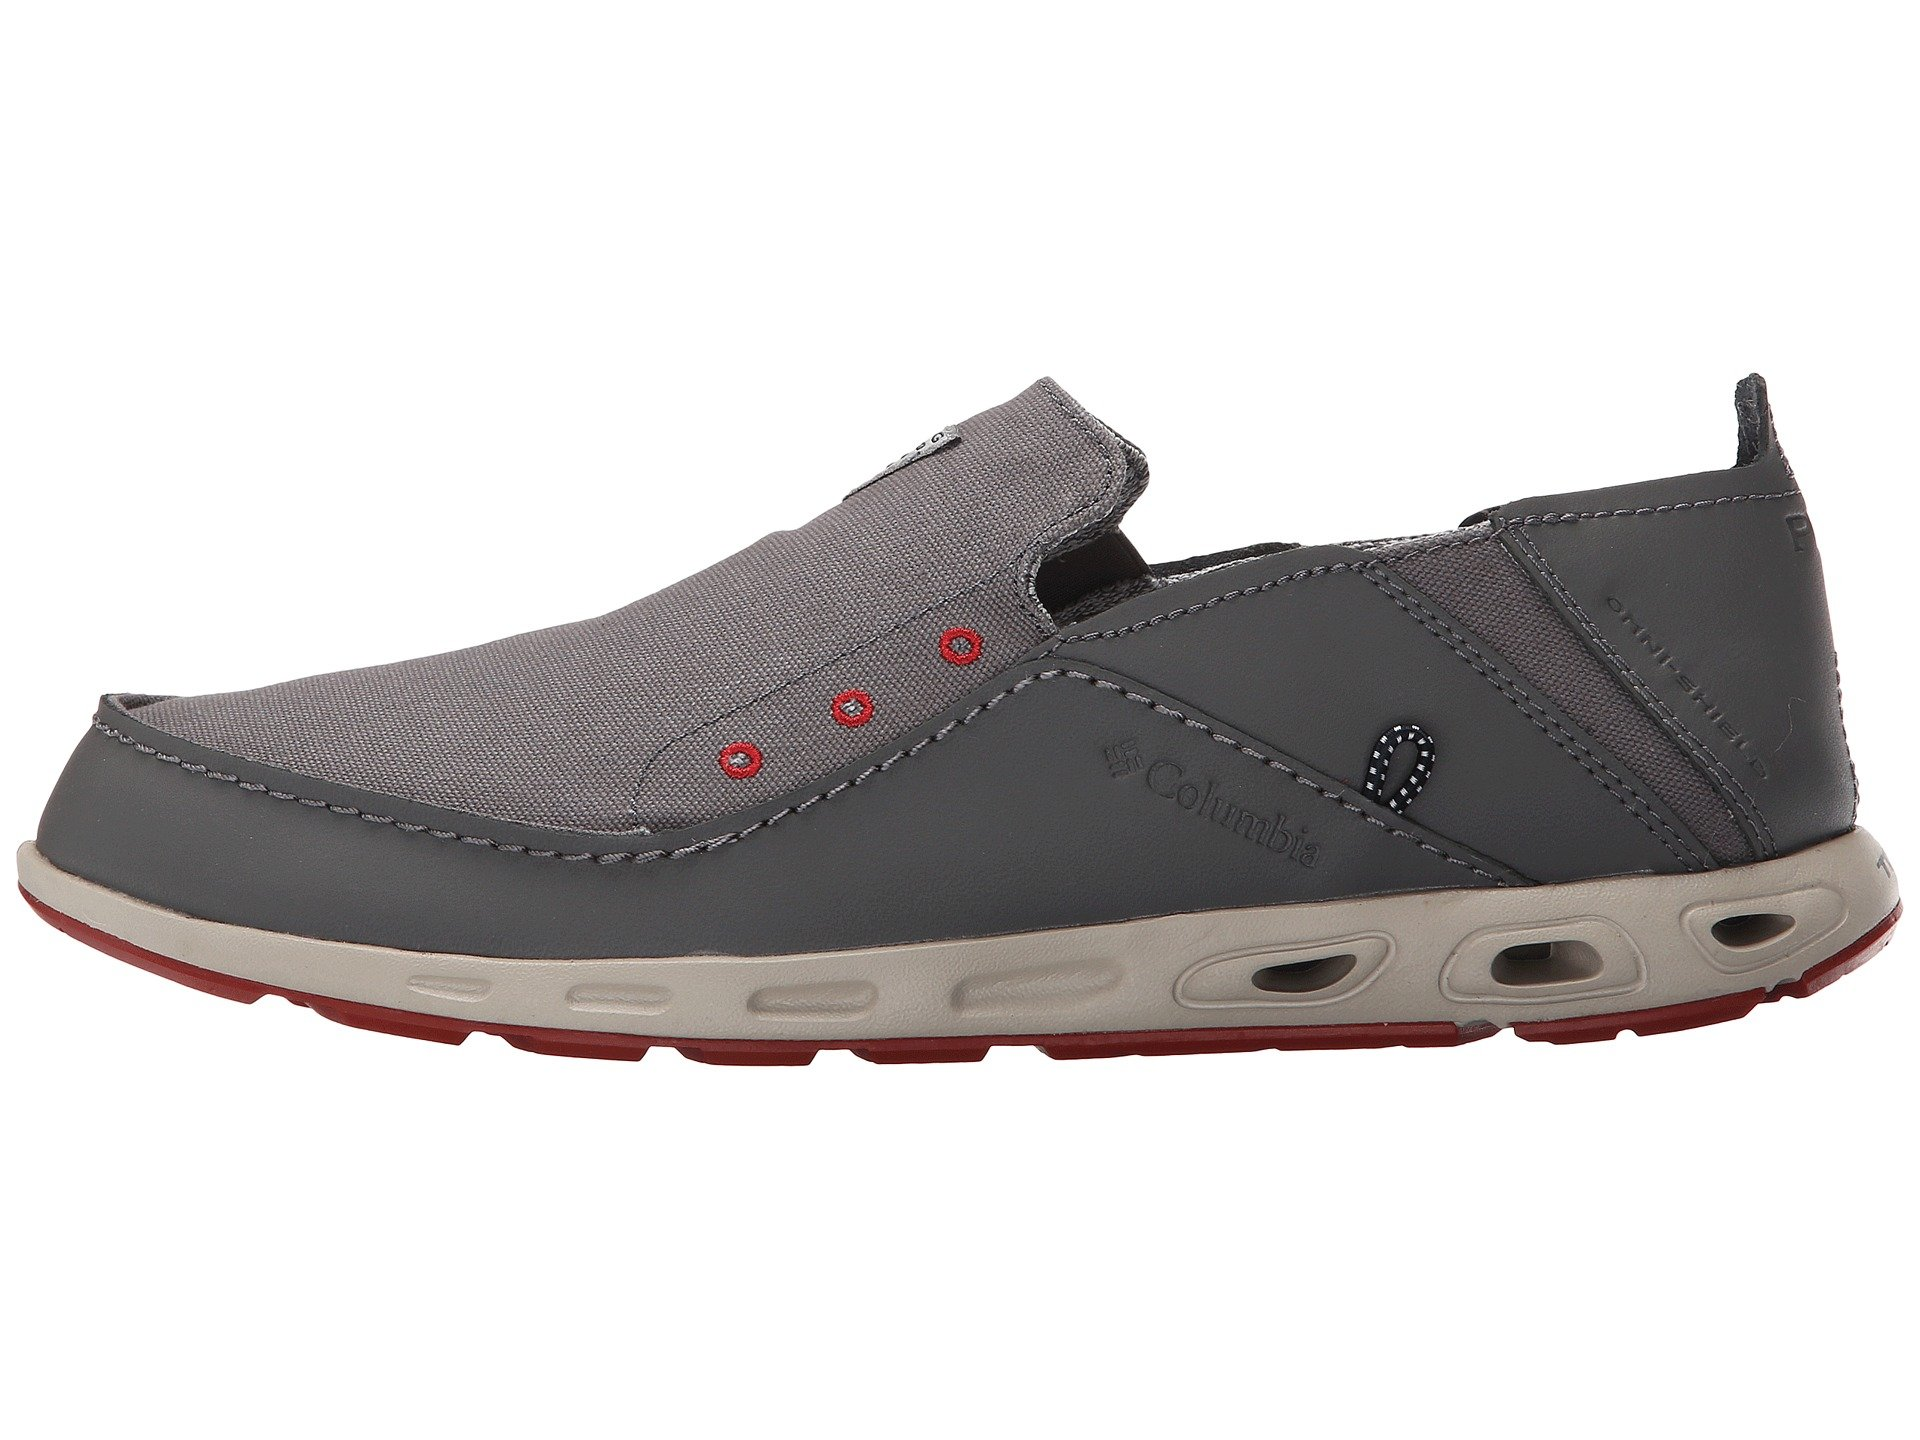 Columbia Men S Bahama Vent Pfg Shoes Wide